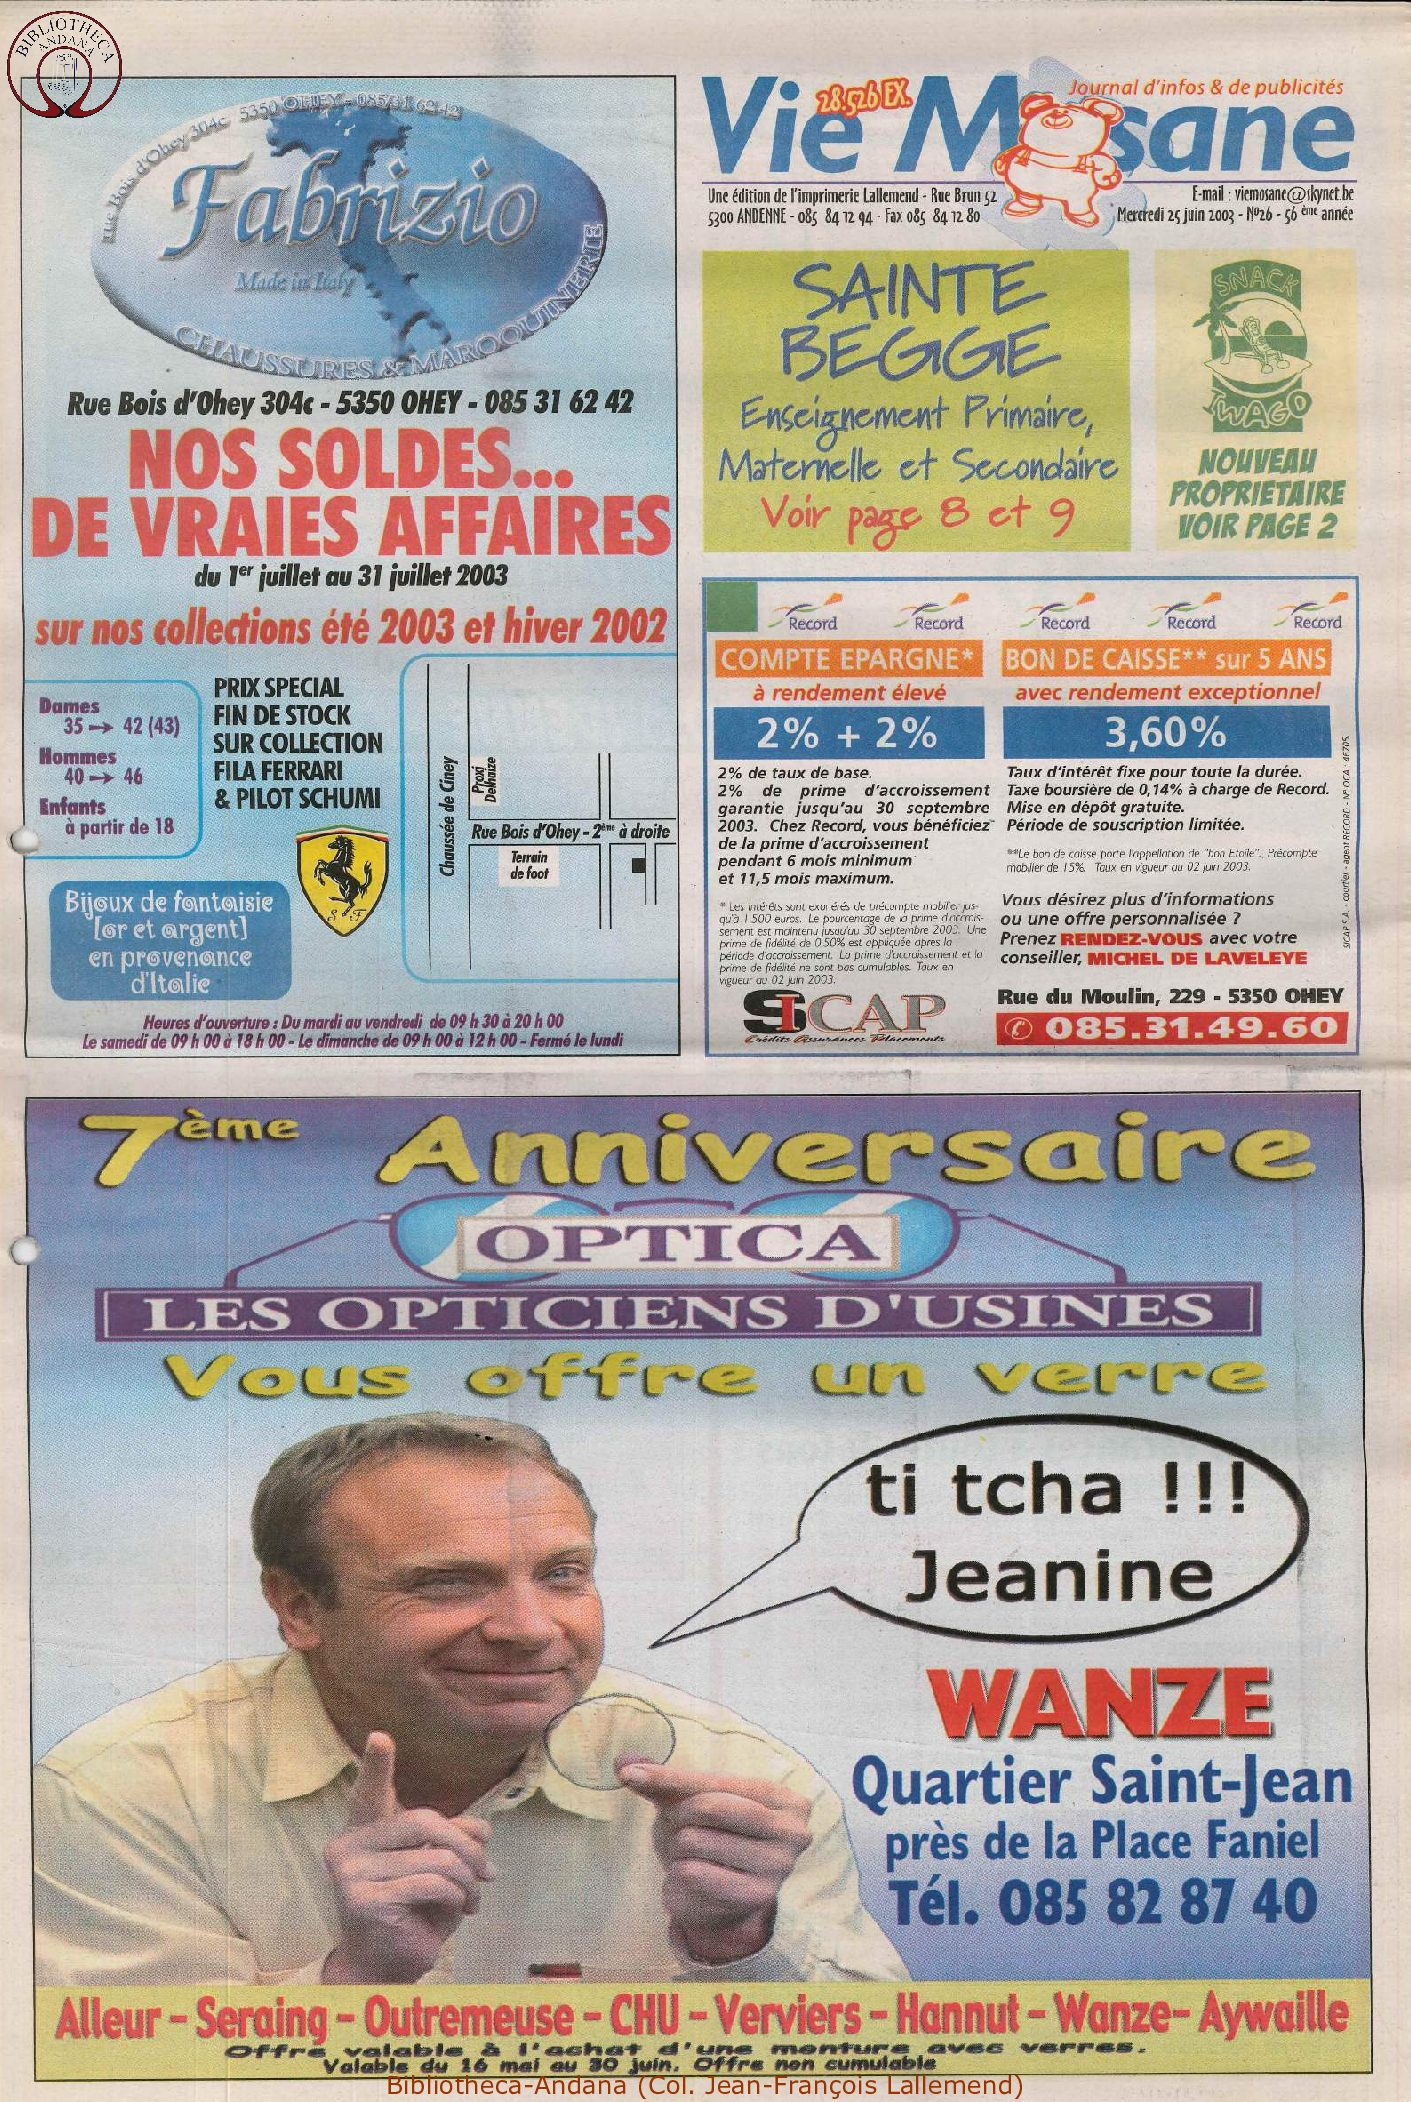 57e année - n°26 - 25 juin 2003